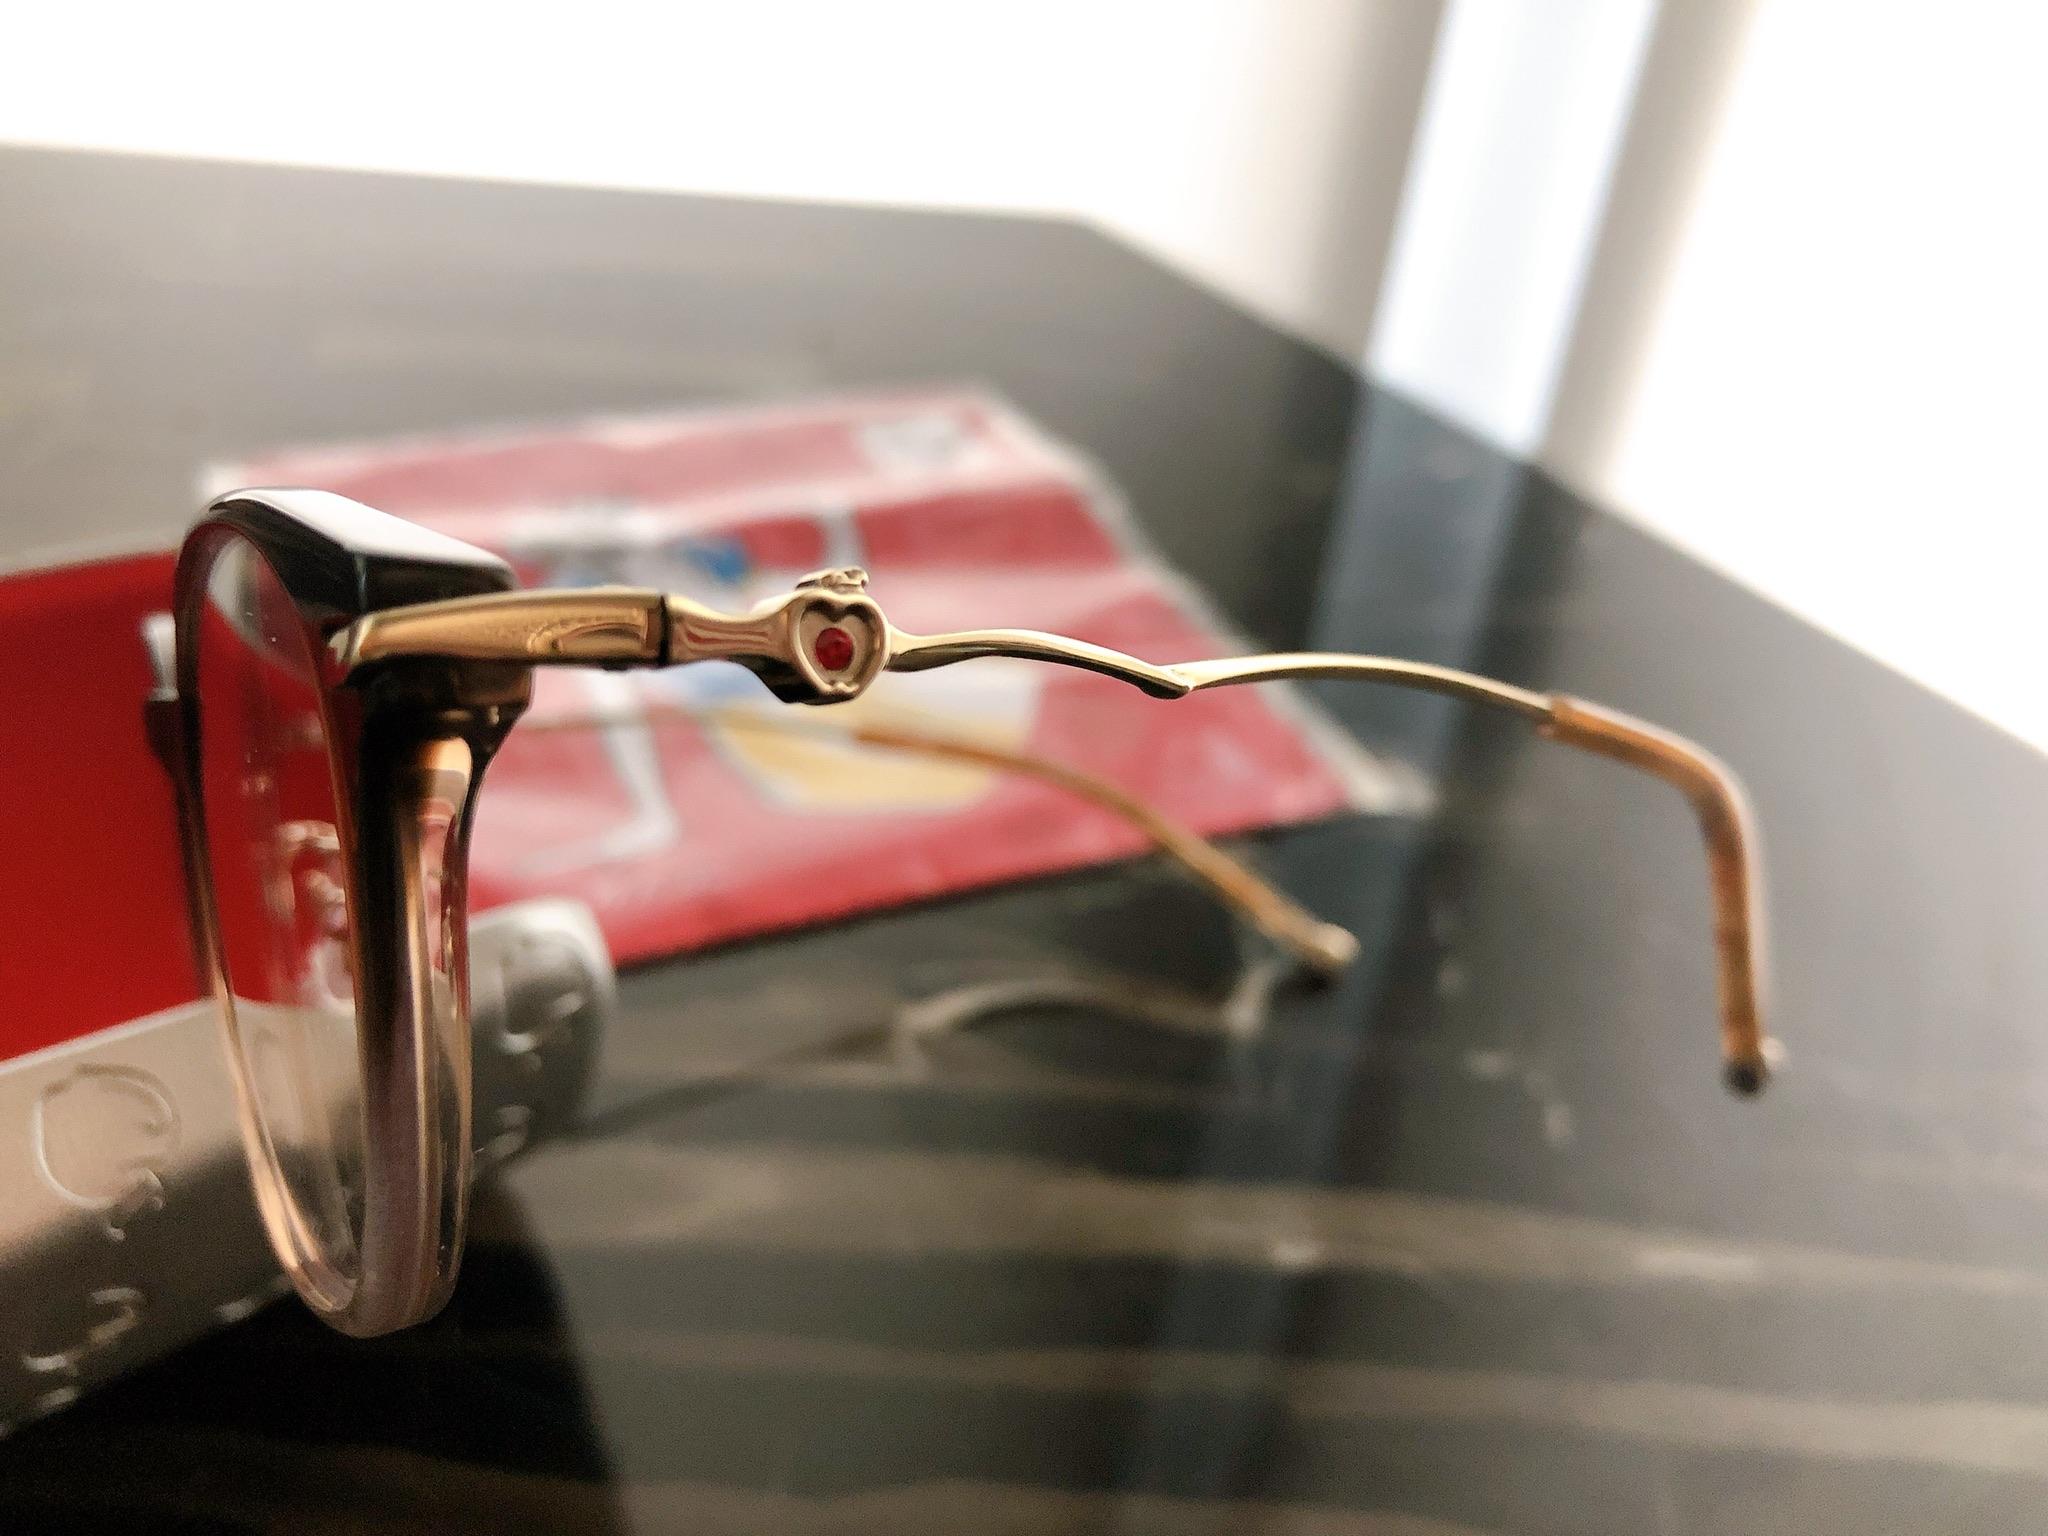 【Zoff】アクセサリーみたいな可愛さ♡ディズニープリンセスのメガネに一目惚れ(๑>◡<๑)! ブルーライトカット仕様は追加料金0円!_3